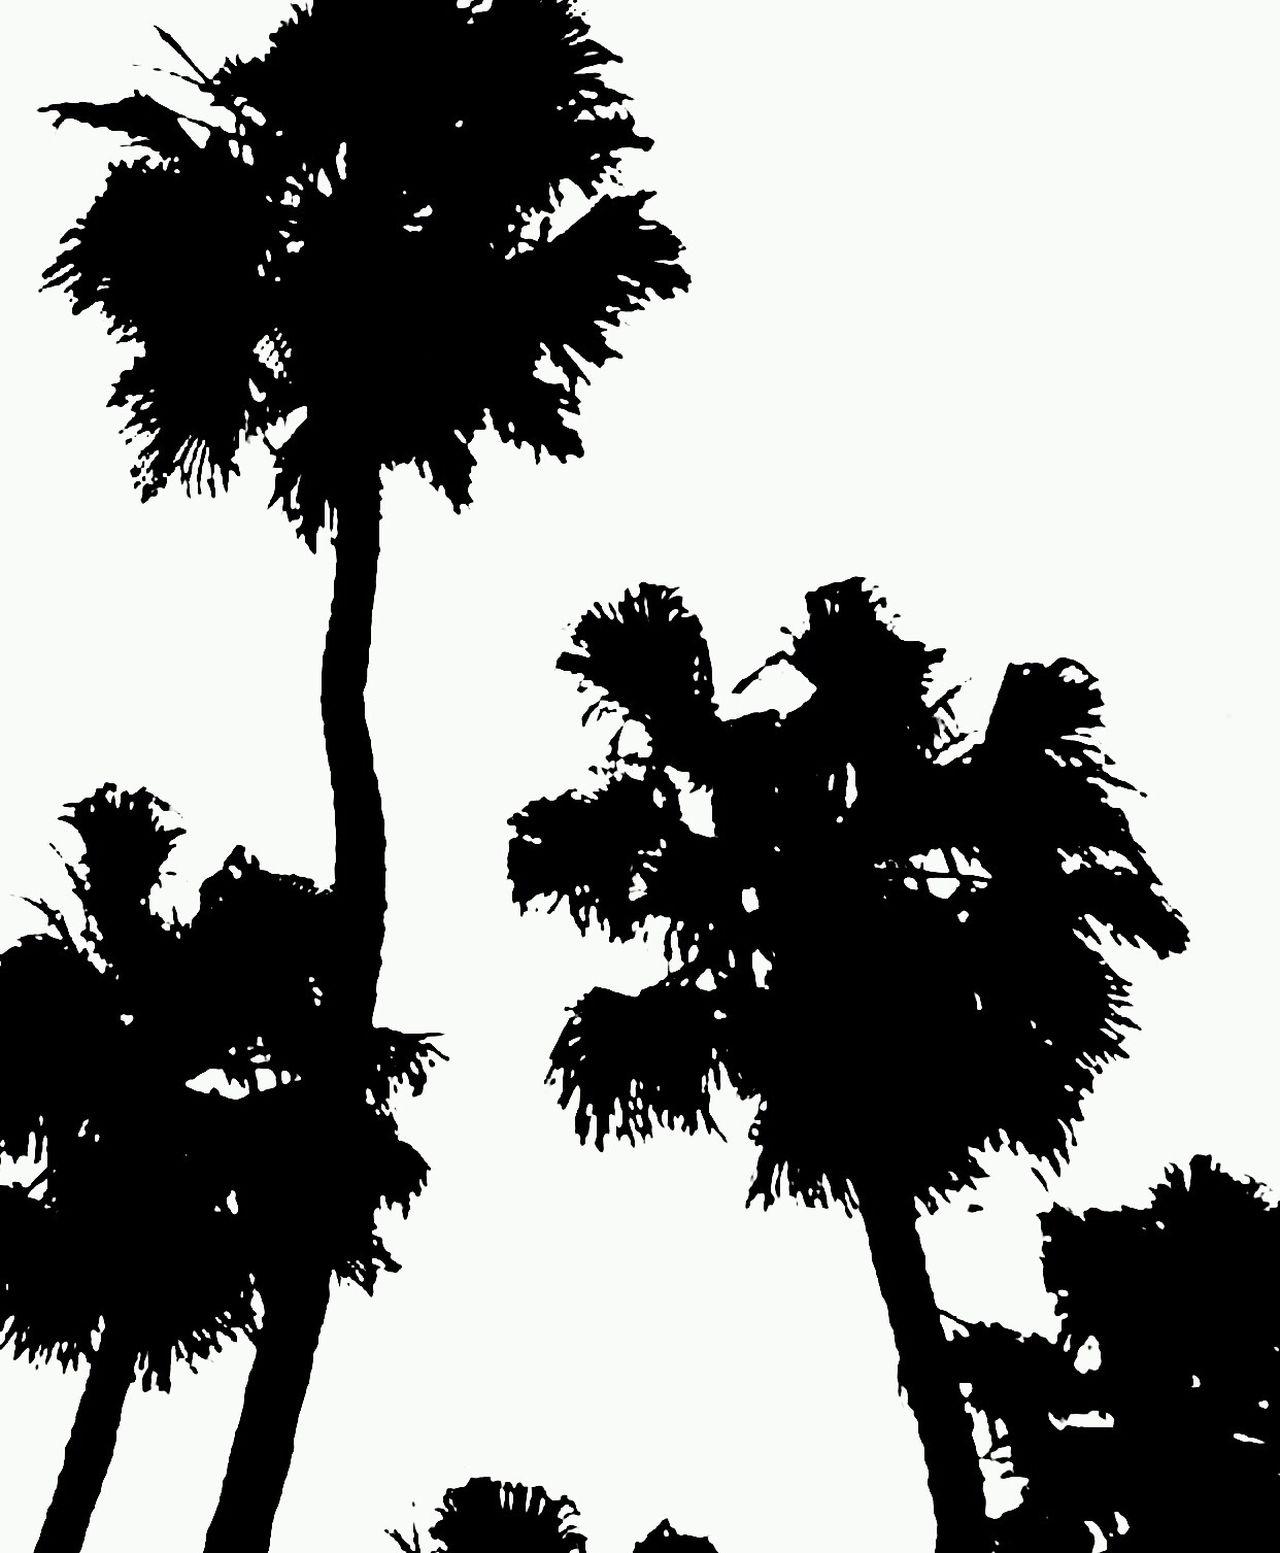 Tree Low Angle View Silhouette No People Palm Tree Nature Outdoors Capture The Moment White Black Black & White Blackandwhite Photography Photography Photooftheday EyeEm EyeEmNewHere EyeEmBestPics EyeEm Best Shots Neighborhood Map